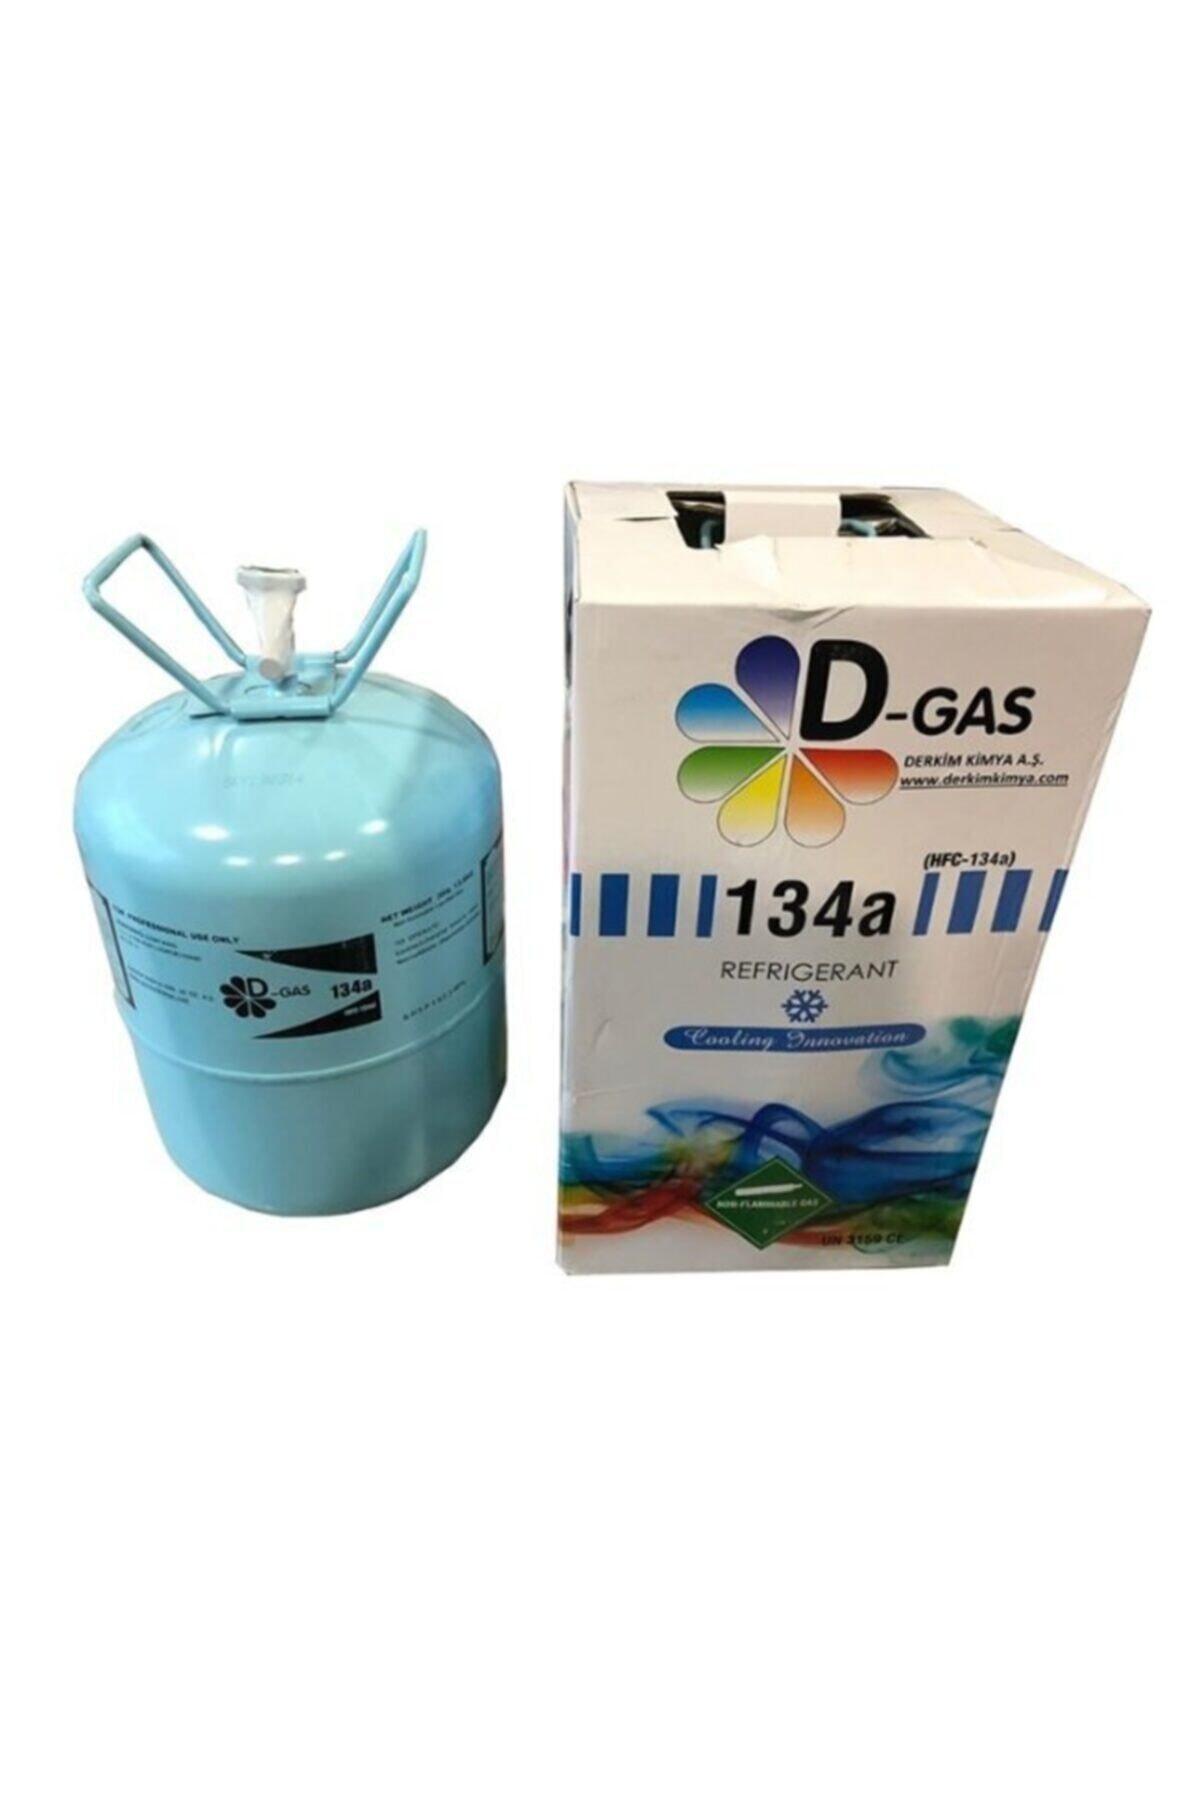 D GAS Klima Gazı 13.6kg R134a 1